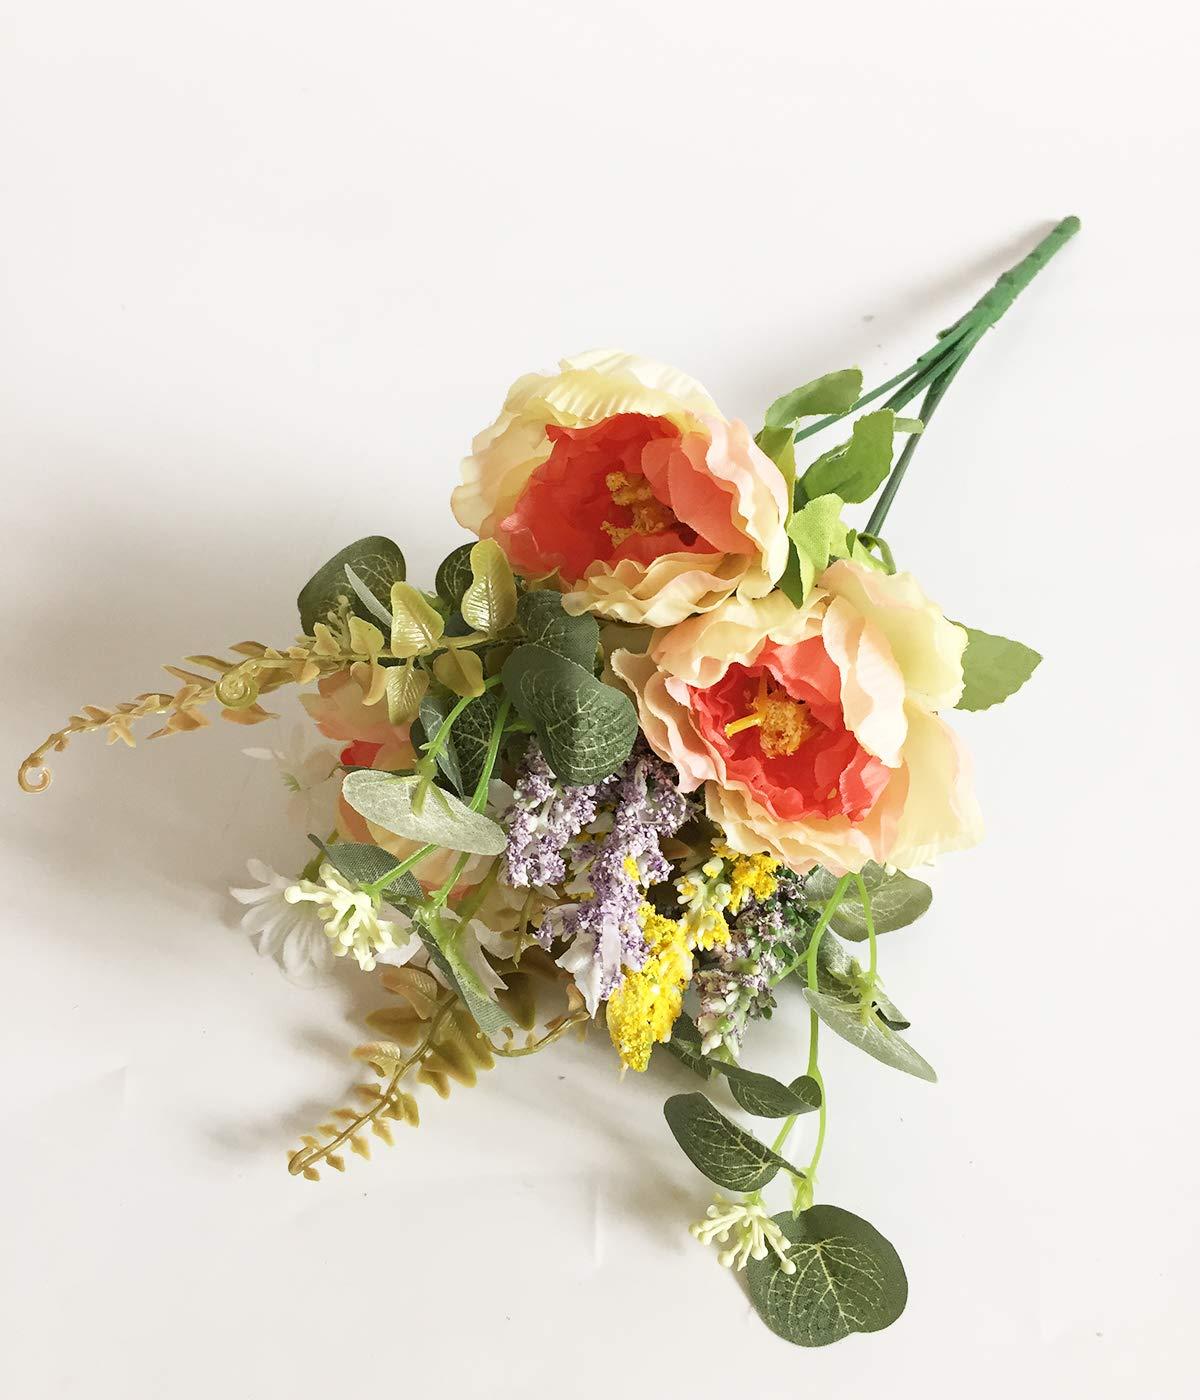 Artfen-3-Bouquet-Country-Style-Artificial-Tea-Rose-Fake-Camellia-Lu-Lotus-Flower-Bouquet-Party-Home-Decor-Approx-115-High